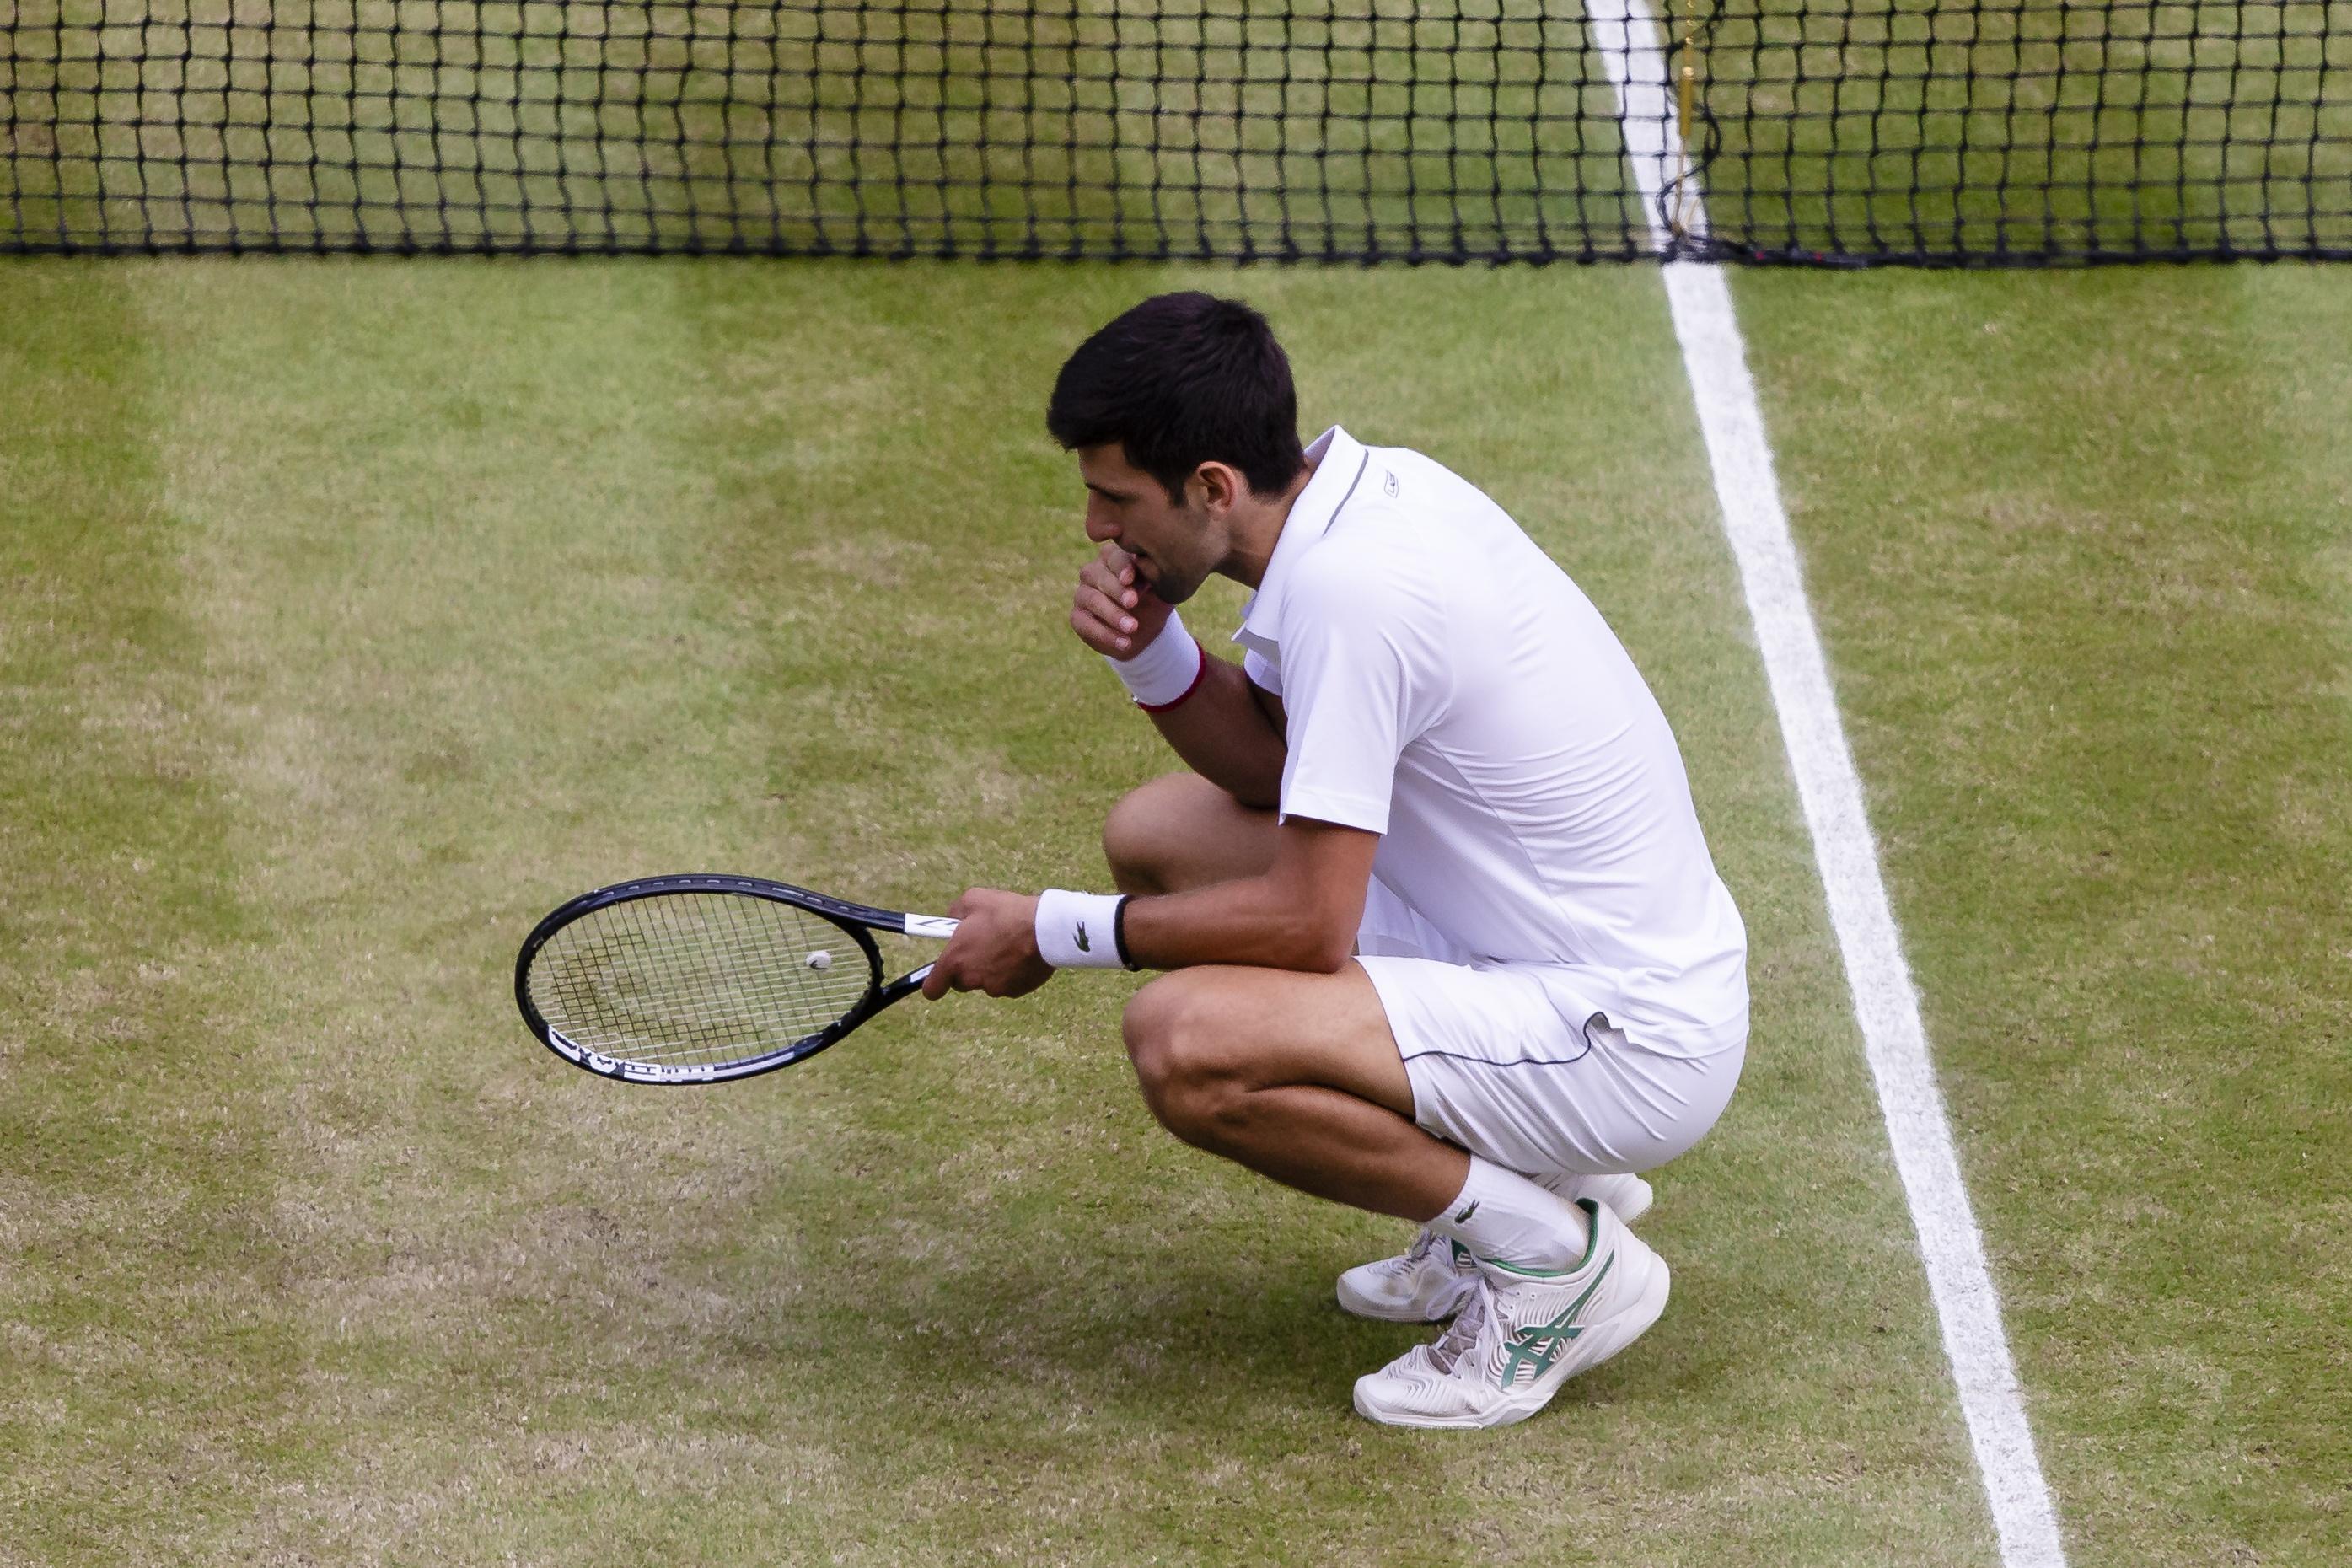 Wimbledon 2020 canceled